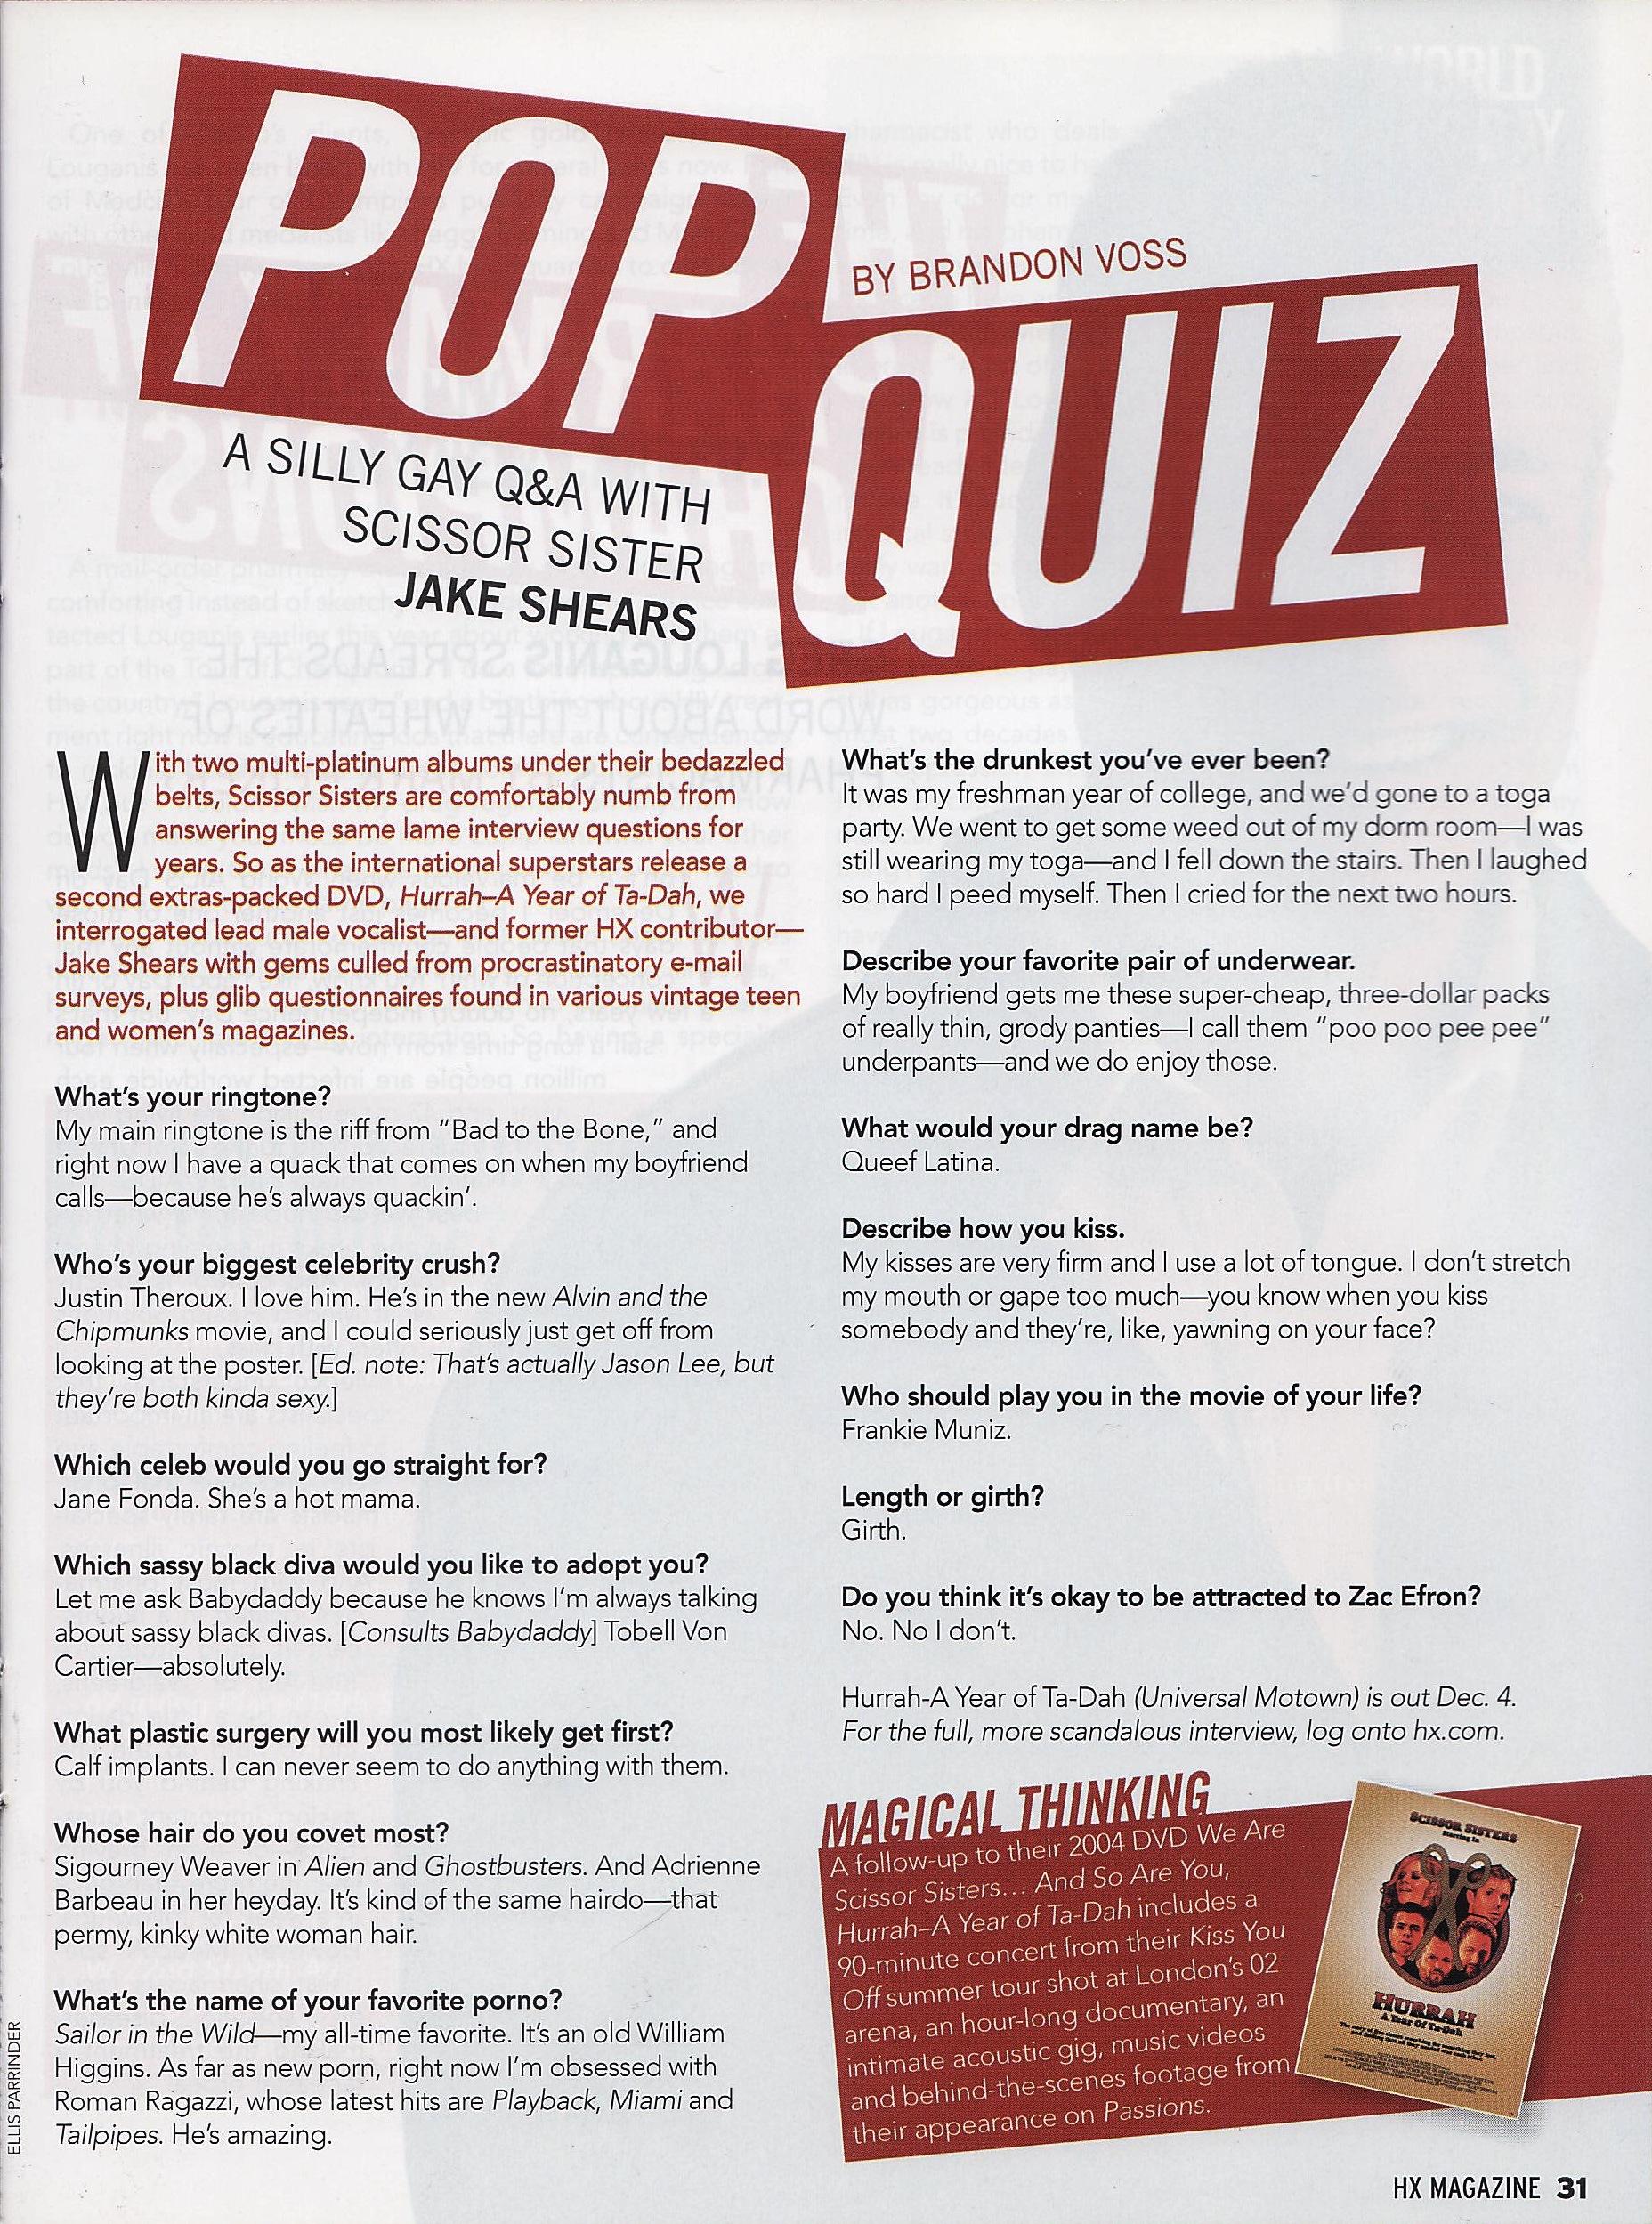 JakeShears2.JPG